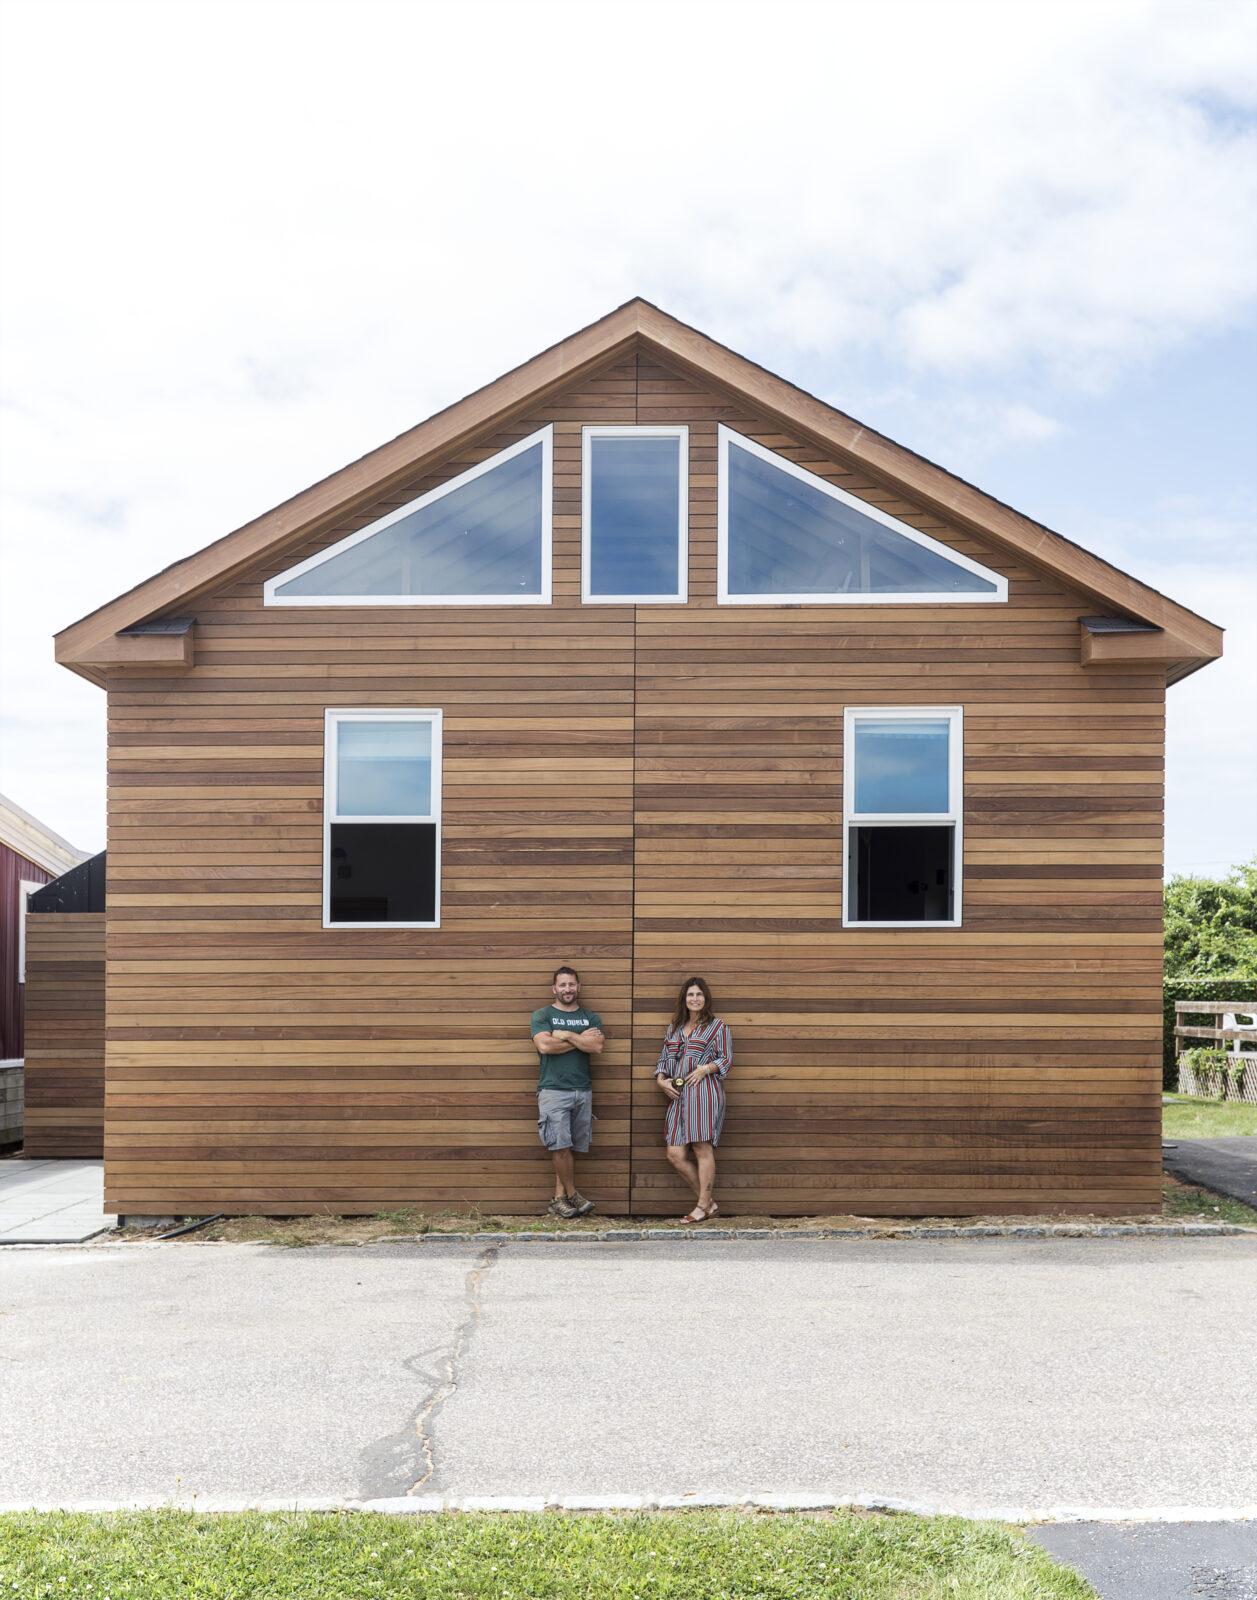 modern beach shack with wood panels designed by courtney and robert novogratz